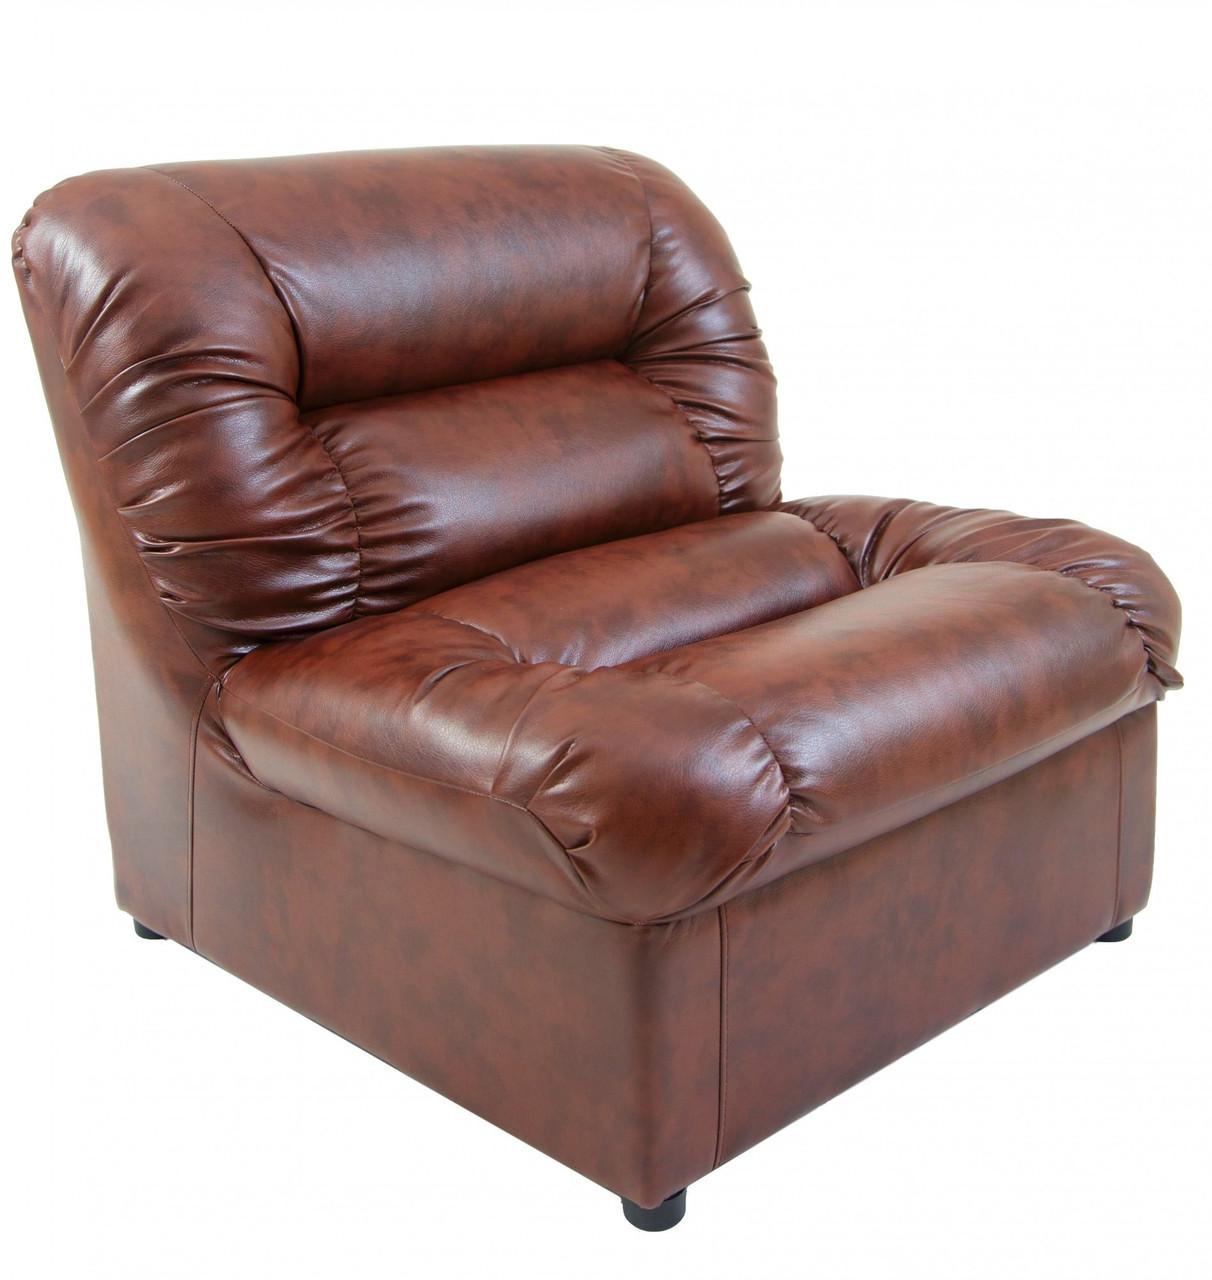 Кресло Richman Визит 870 x 850 x 850H см Мадрас Tobacco Коричневое